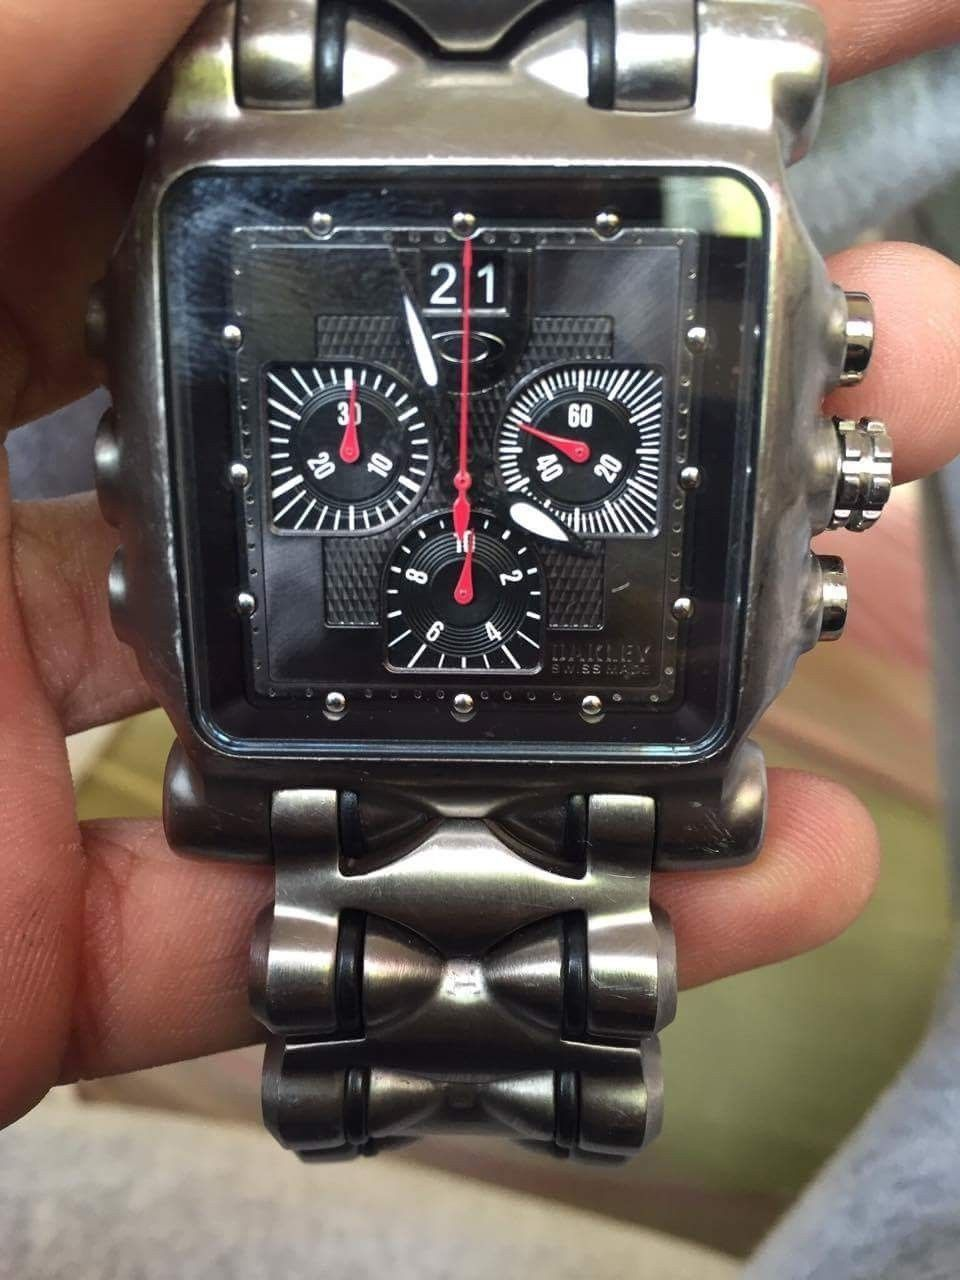 Minute Machine  Original  or Fake ? - 59bd51f9-3cf8-4d90-9687-8e56ab77c867.jpeg